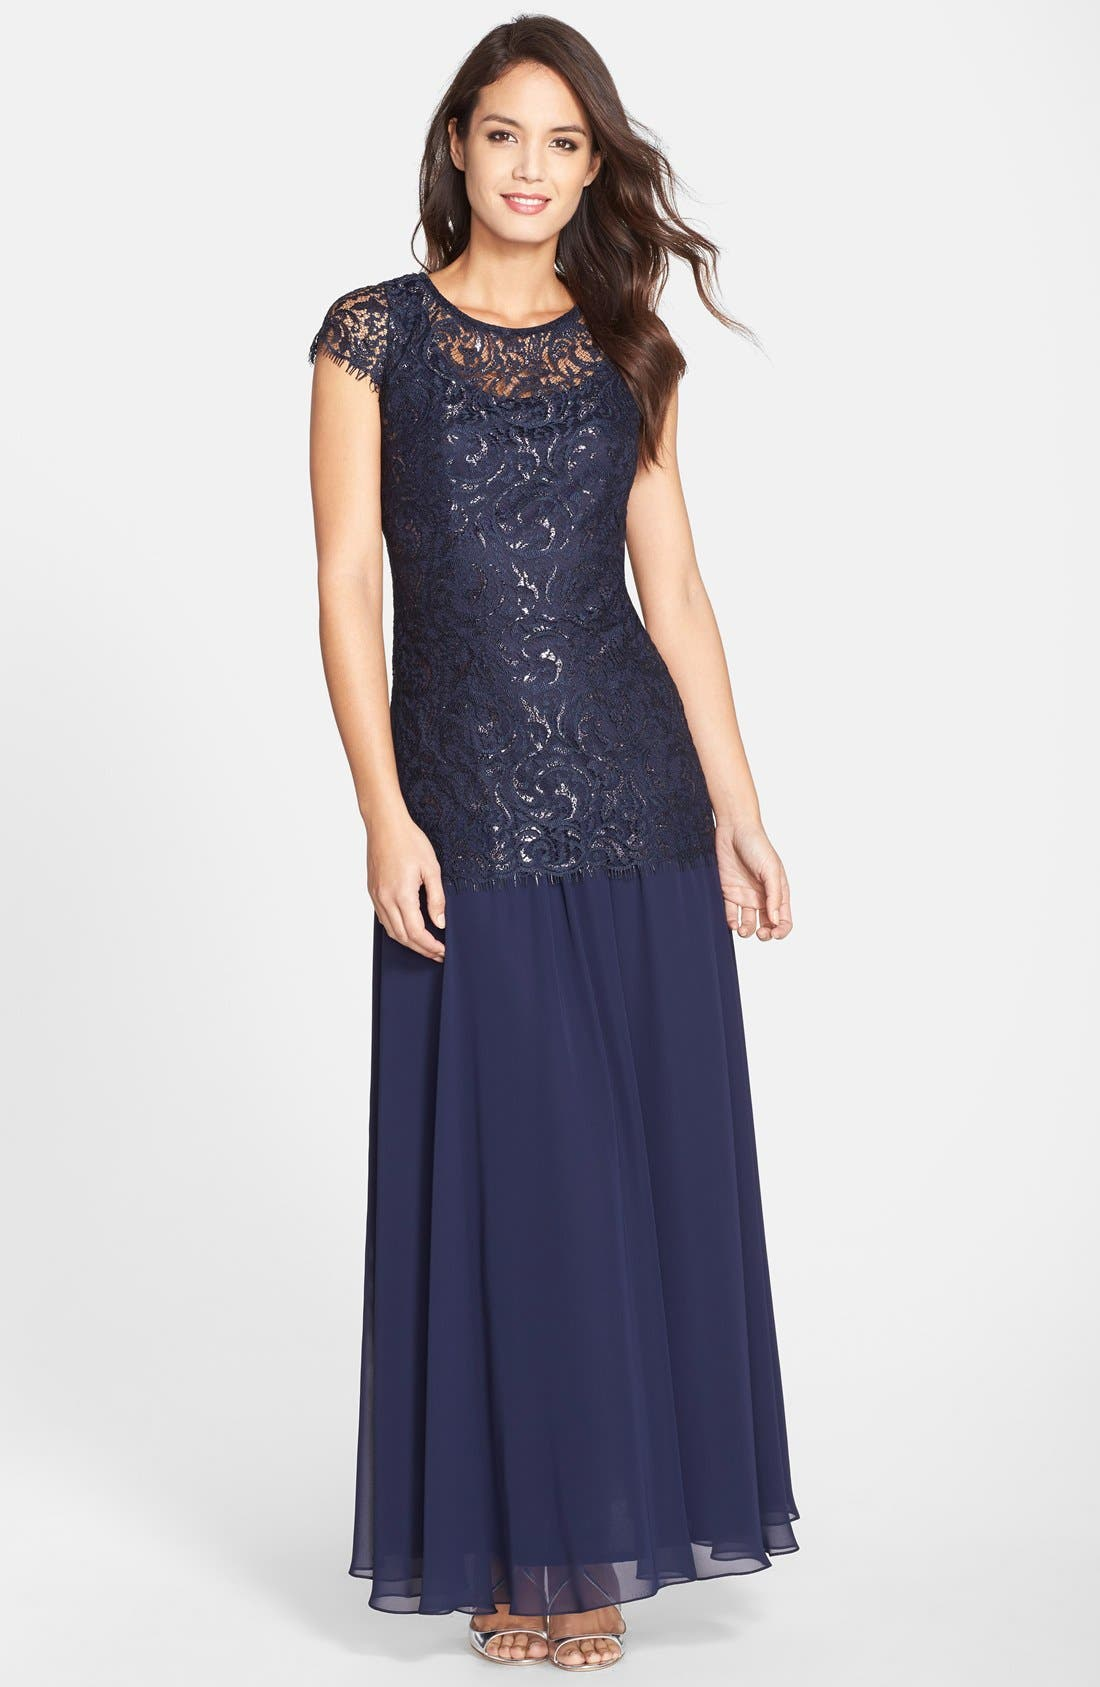 Main Image - Alex Evenings Metallic Lace & Chiffon Gown